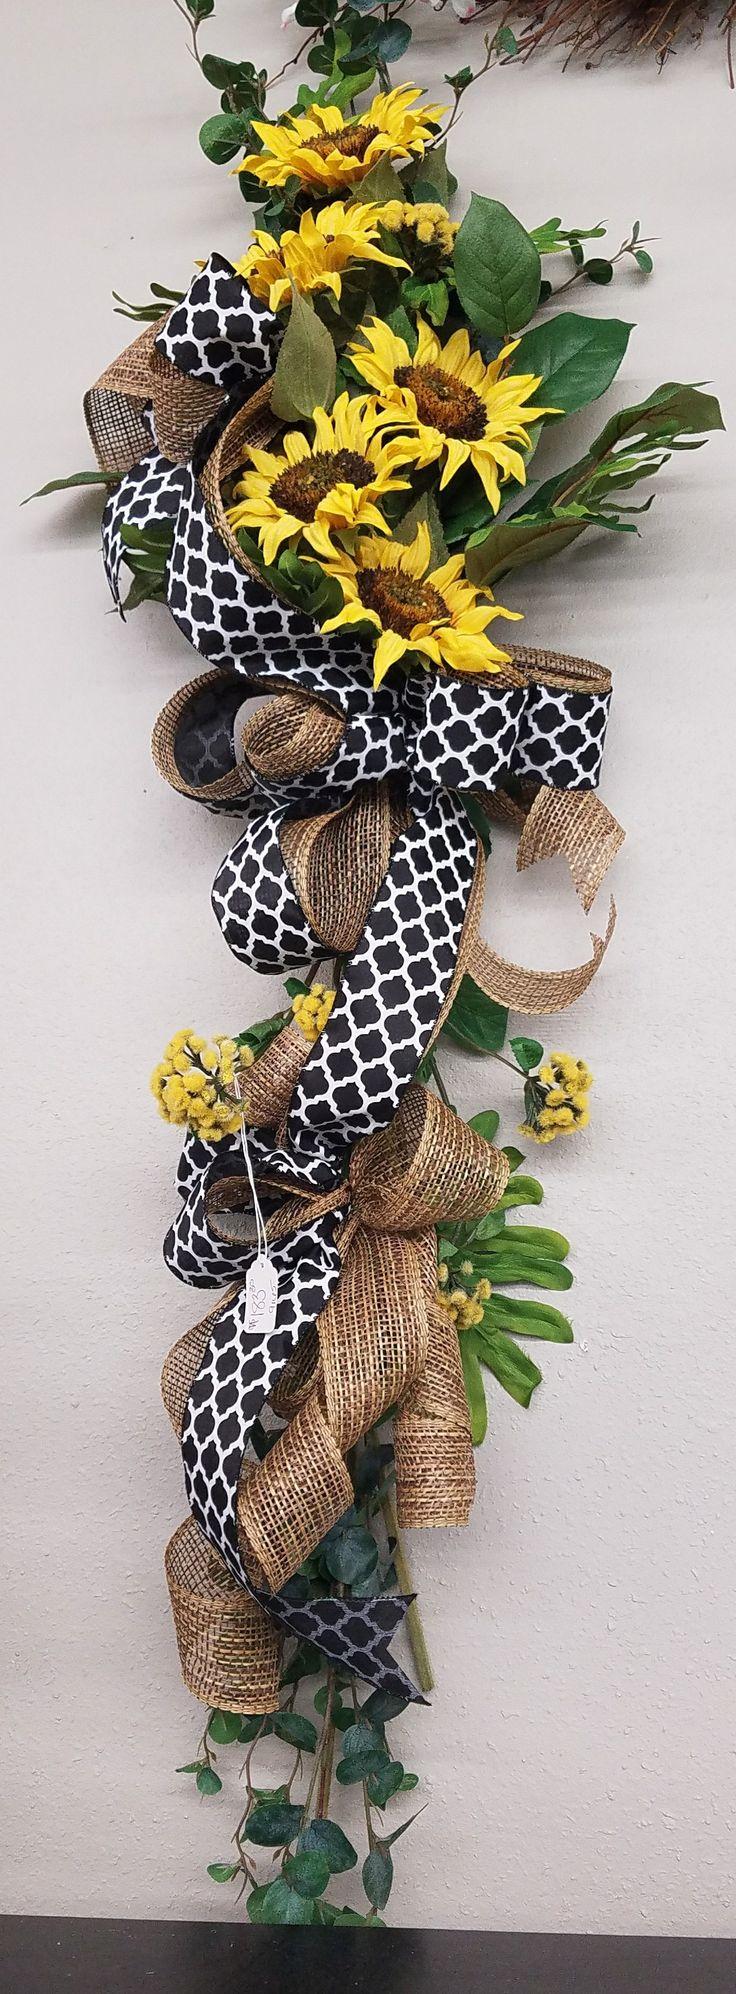 Sunflower swag with black and white ribbon, burlap, split leaf philodendron, designed by Master Designer Nichole Lefebvre at Silks and Crafts in Denham Springs,  LA